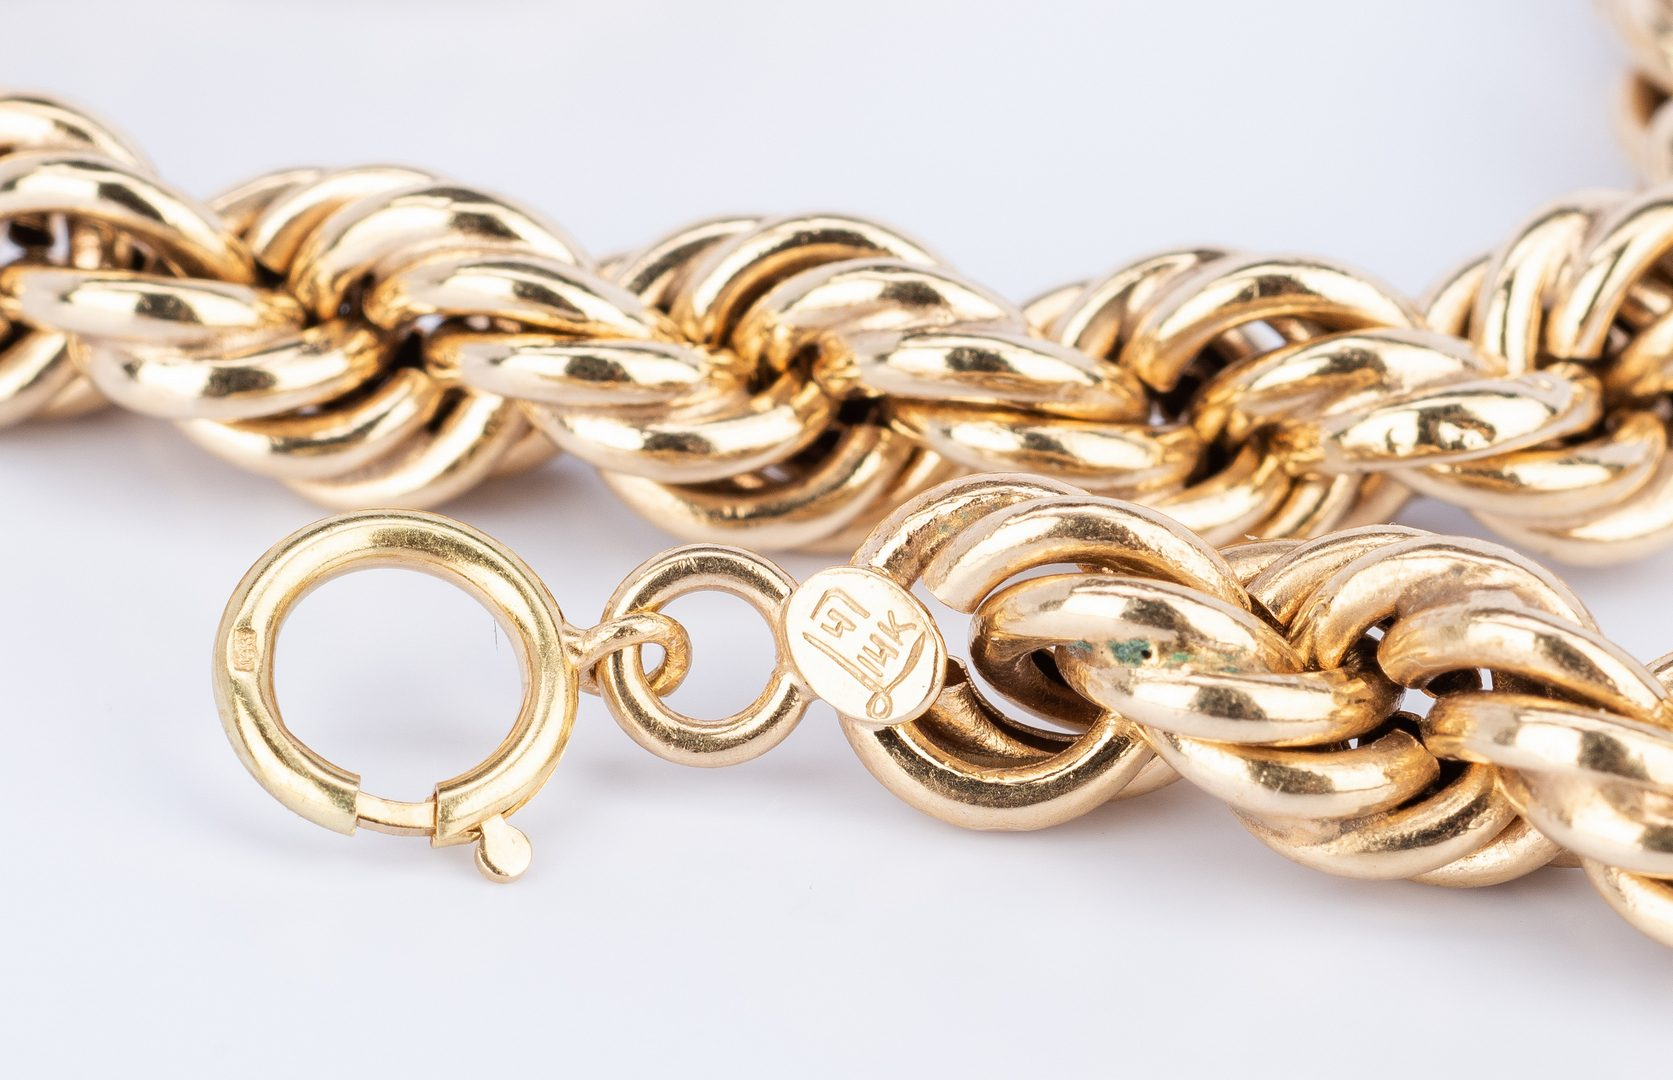 Lot 402: 3 Piece Set 14k Rope Jewelry